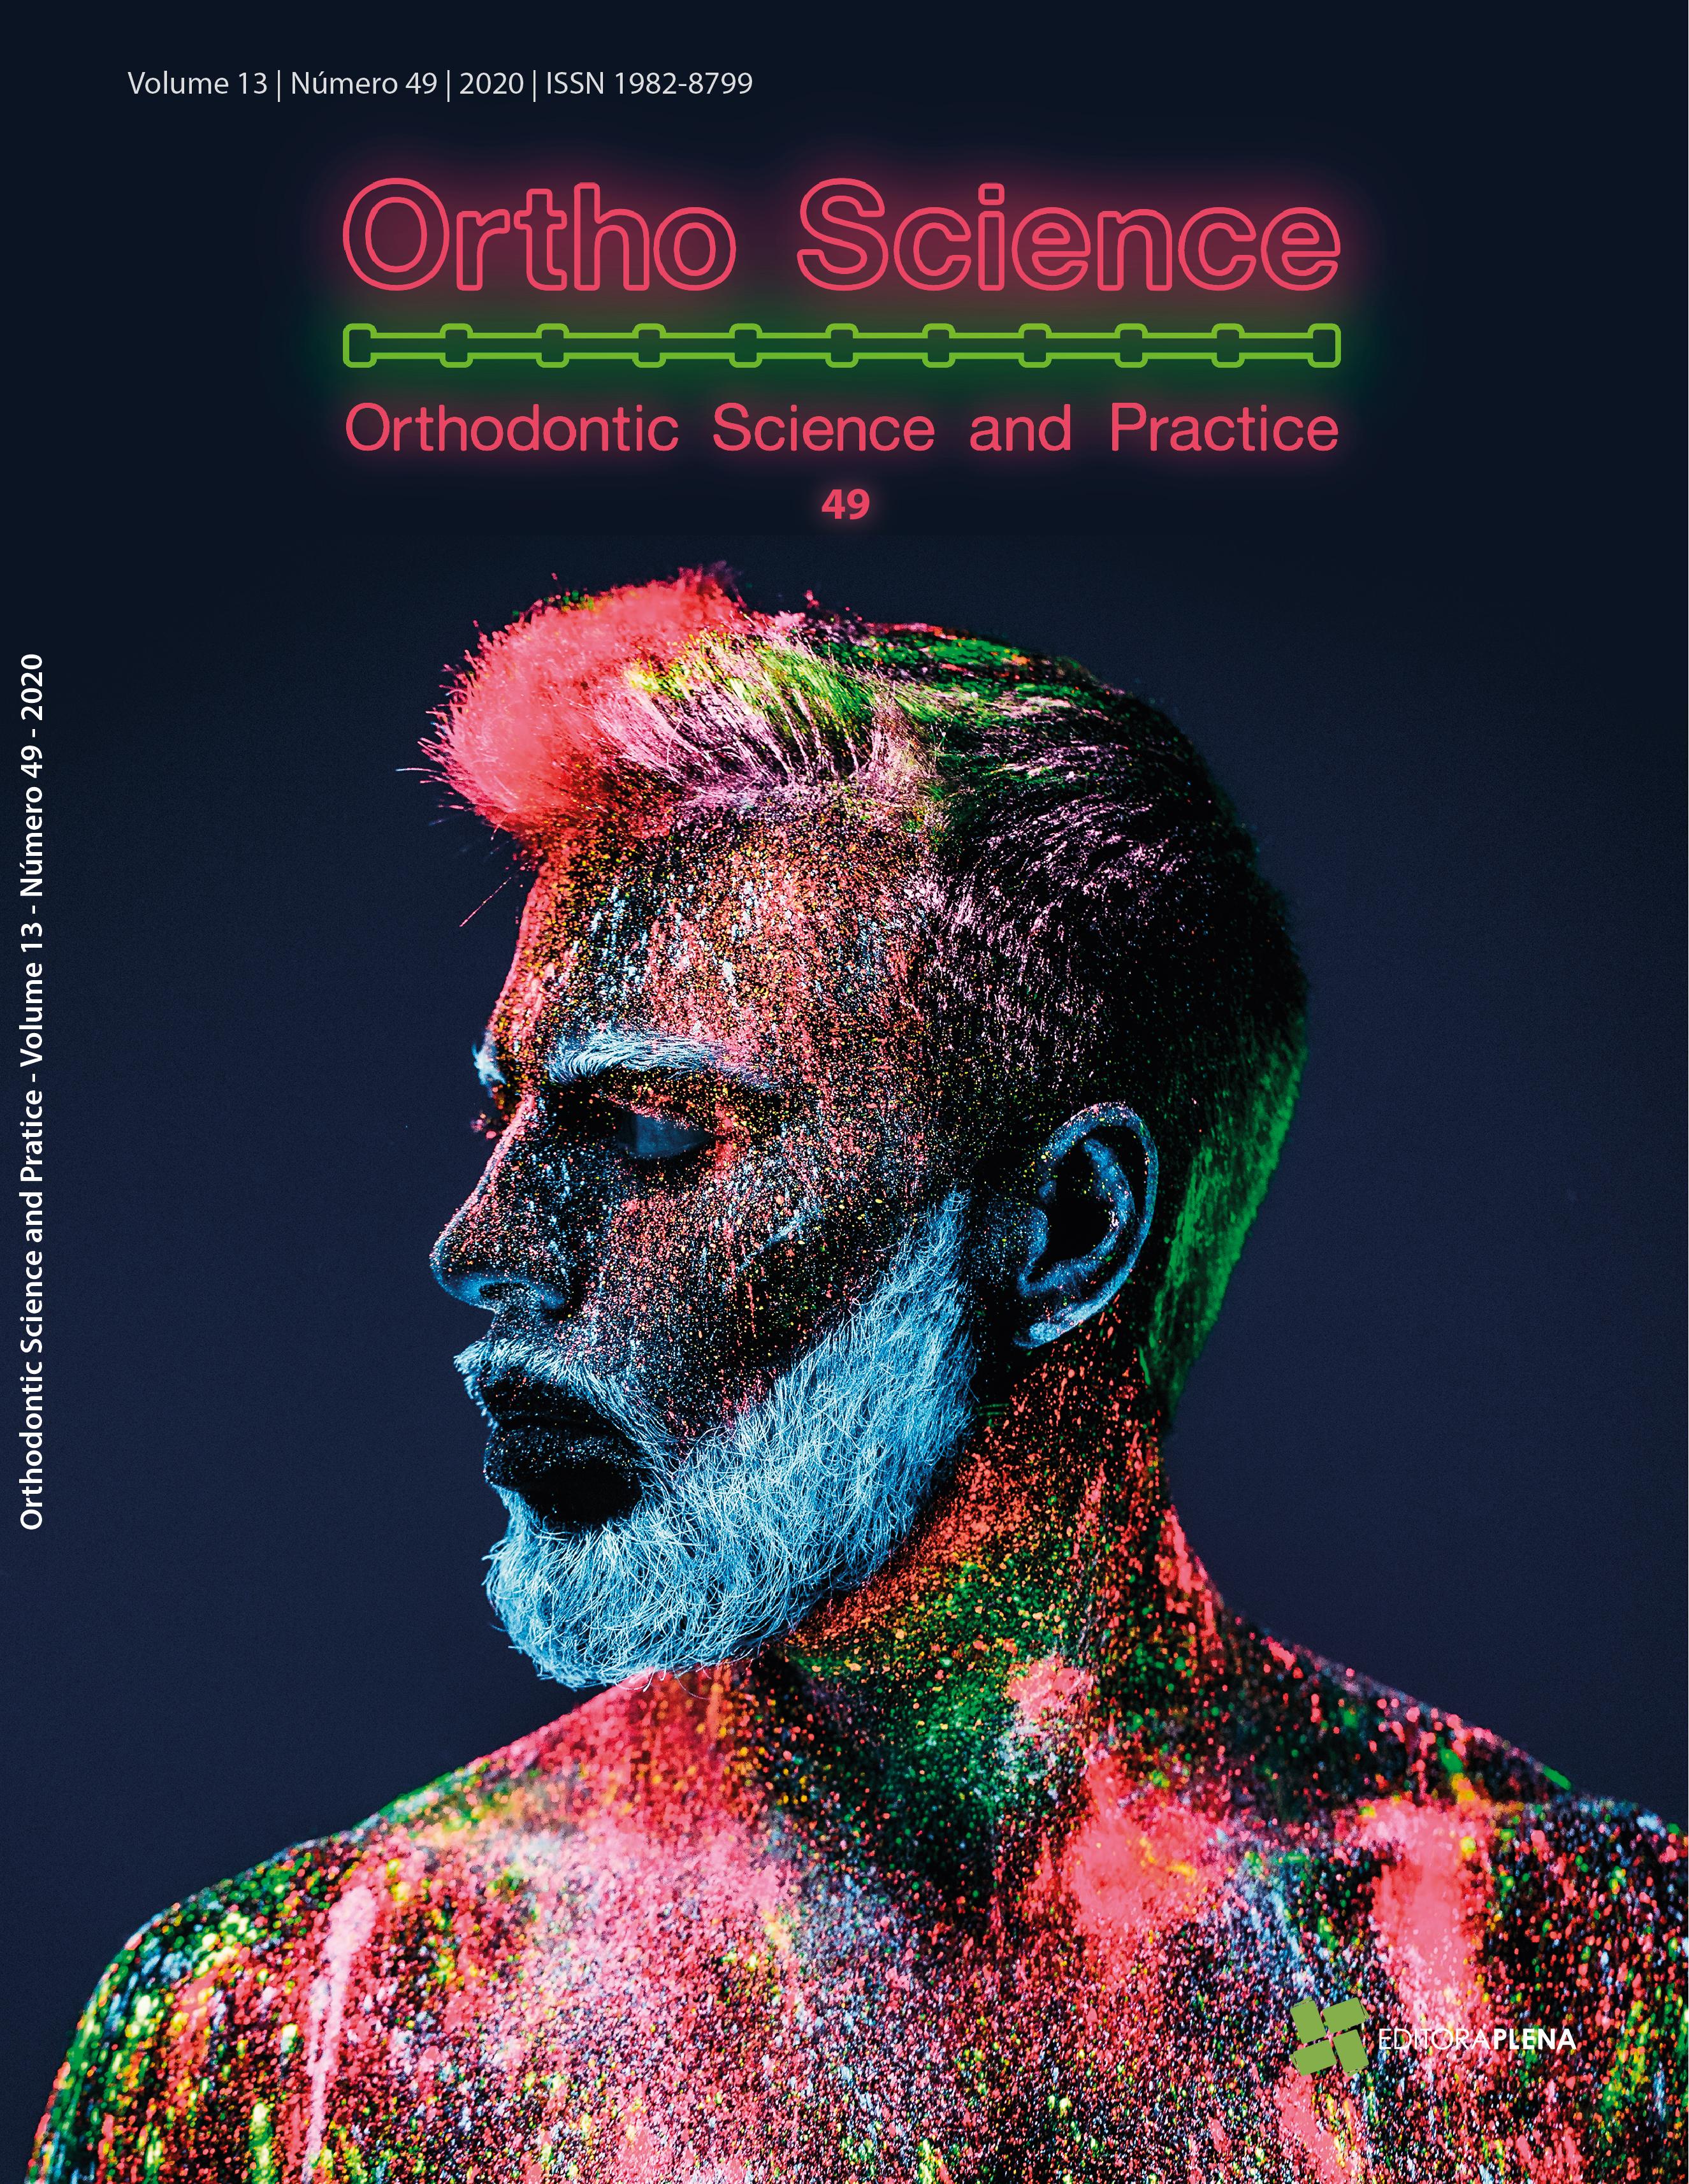 A 49ª edição da Ortho Science já está disponível na versão digital.